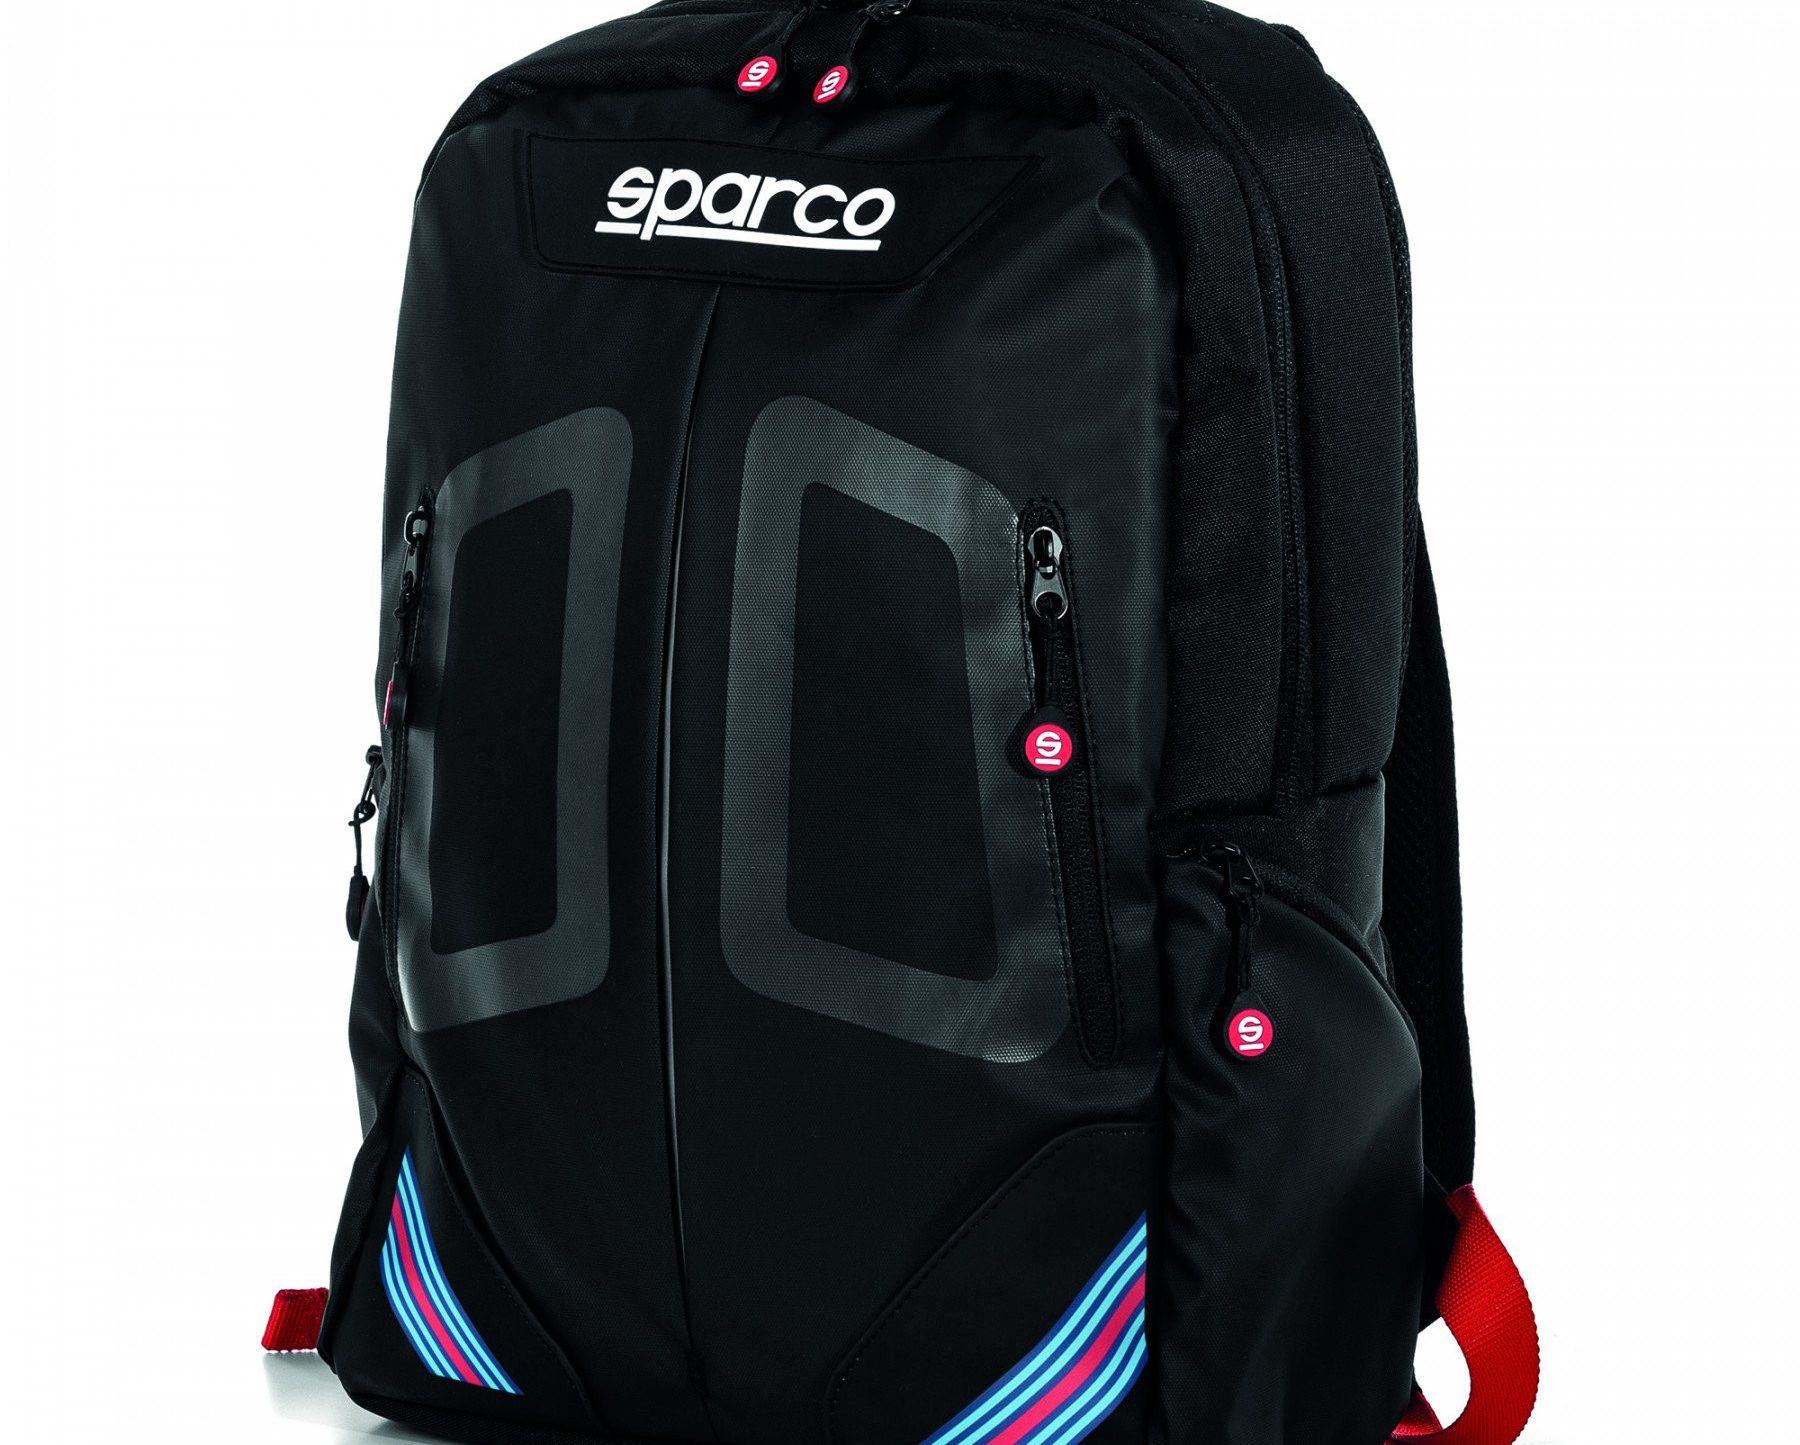 Нов продукт: Sparco Martini Racing, раница